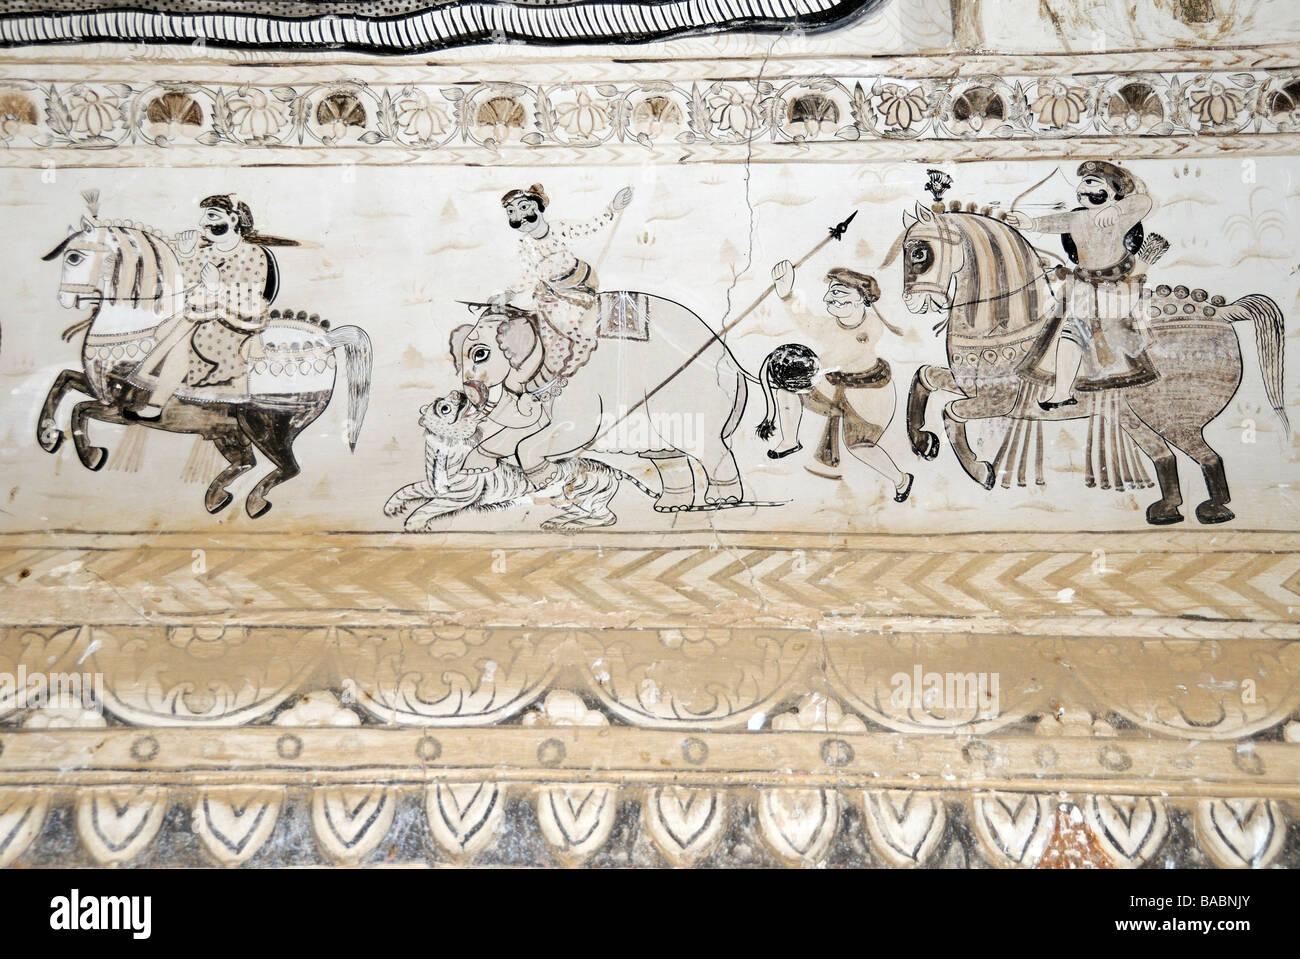 Mural de cazadores a caballo y un elefante de ser atacado por un tigre en el Laxmi Narayan Lackshmi o templo de Imagen De Stock